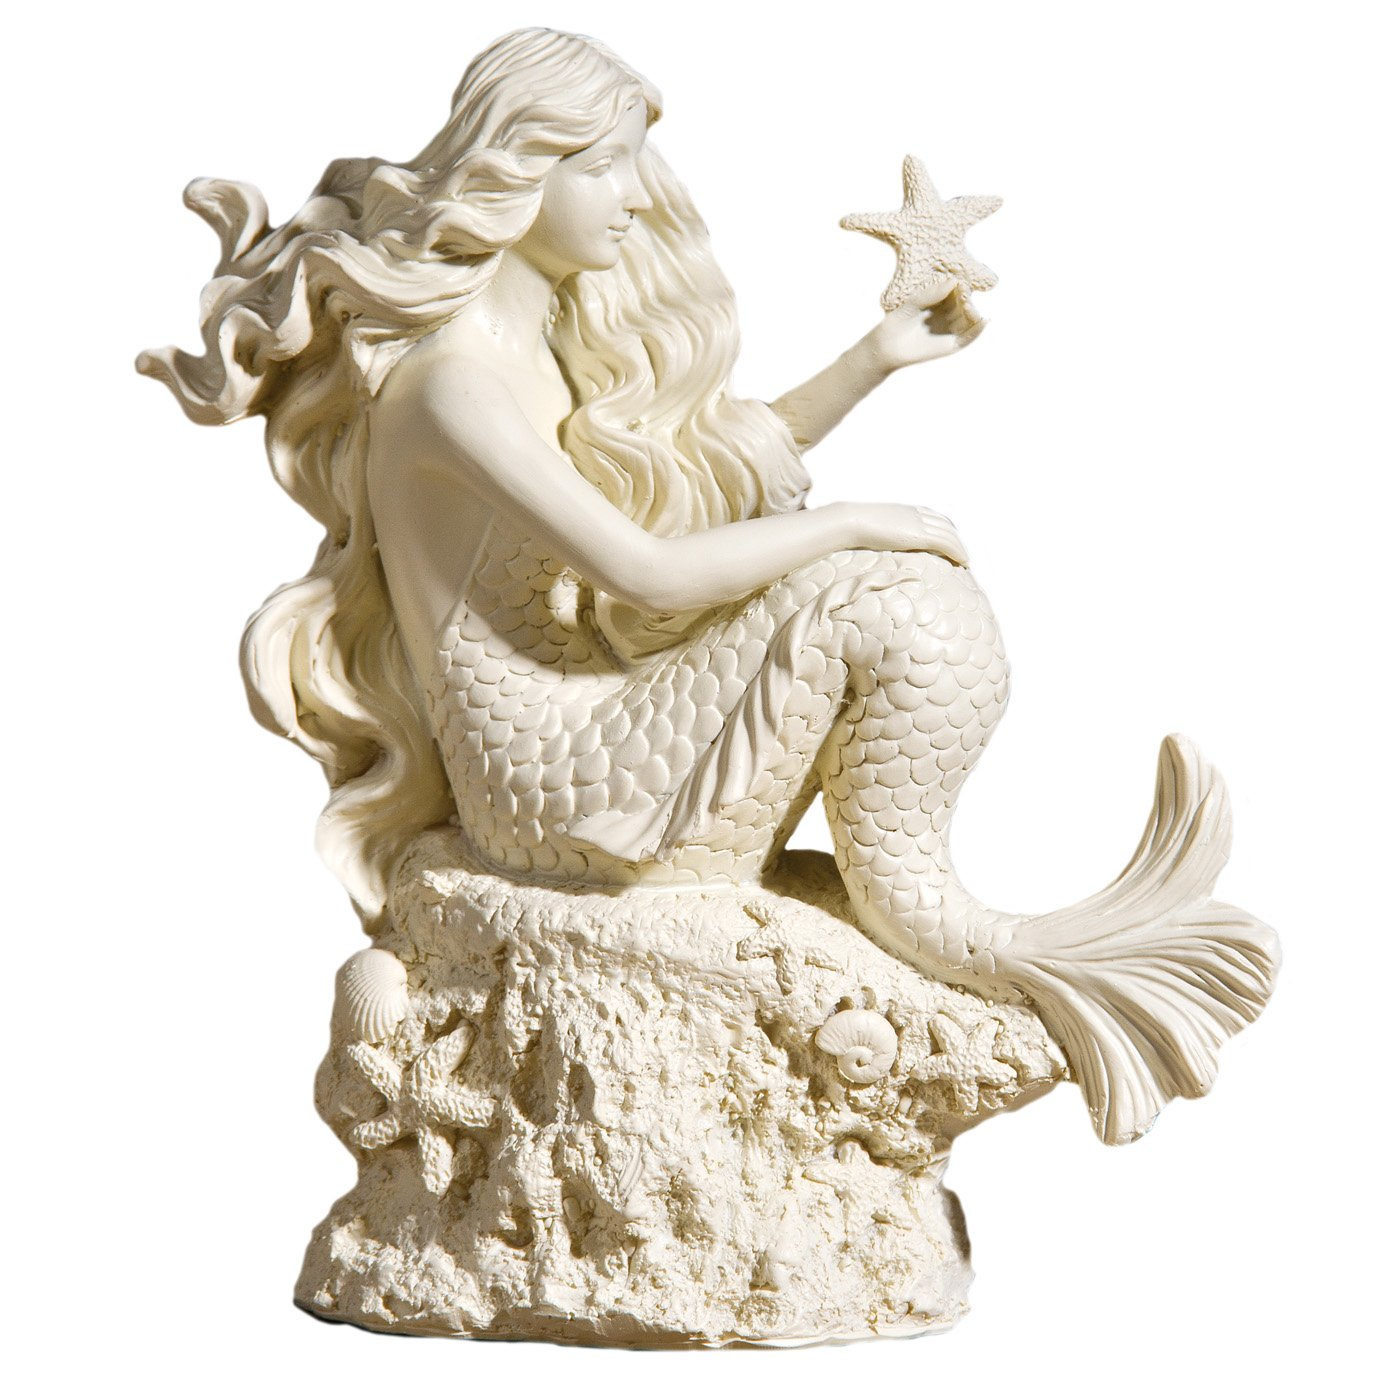 Ohio Wholesale Mermaid Statue